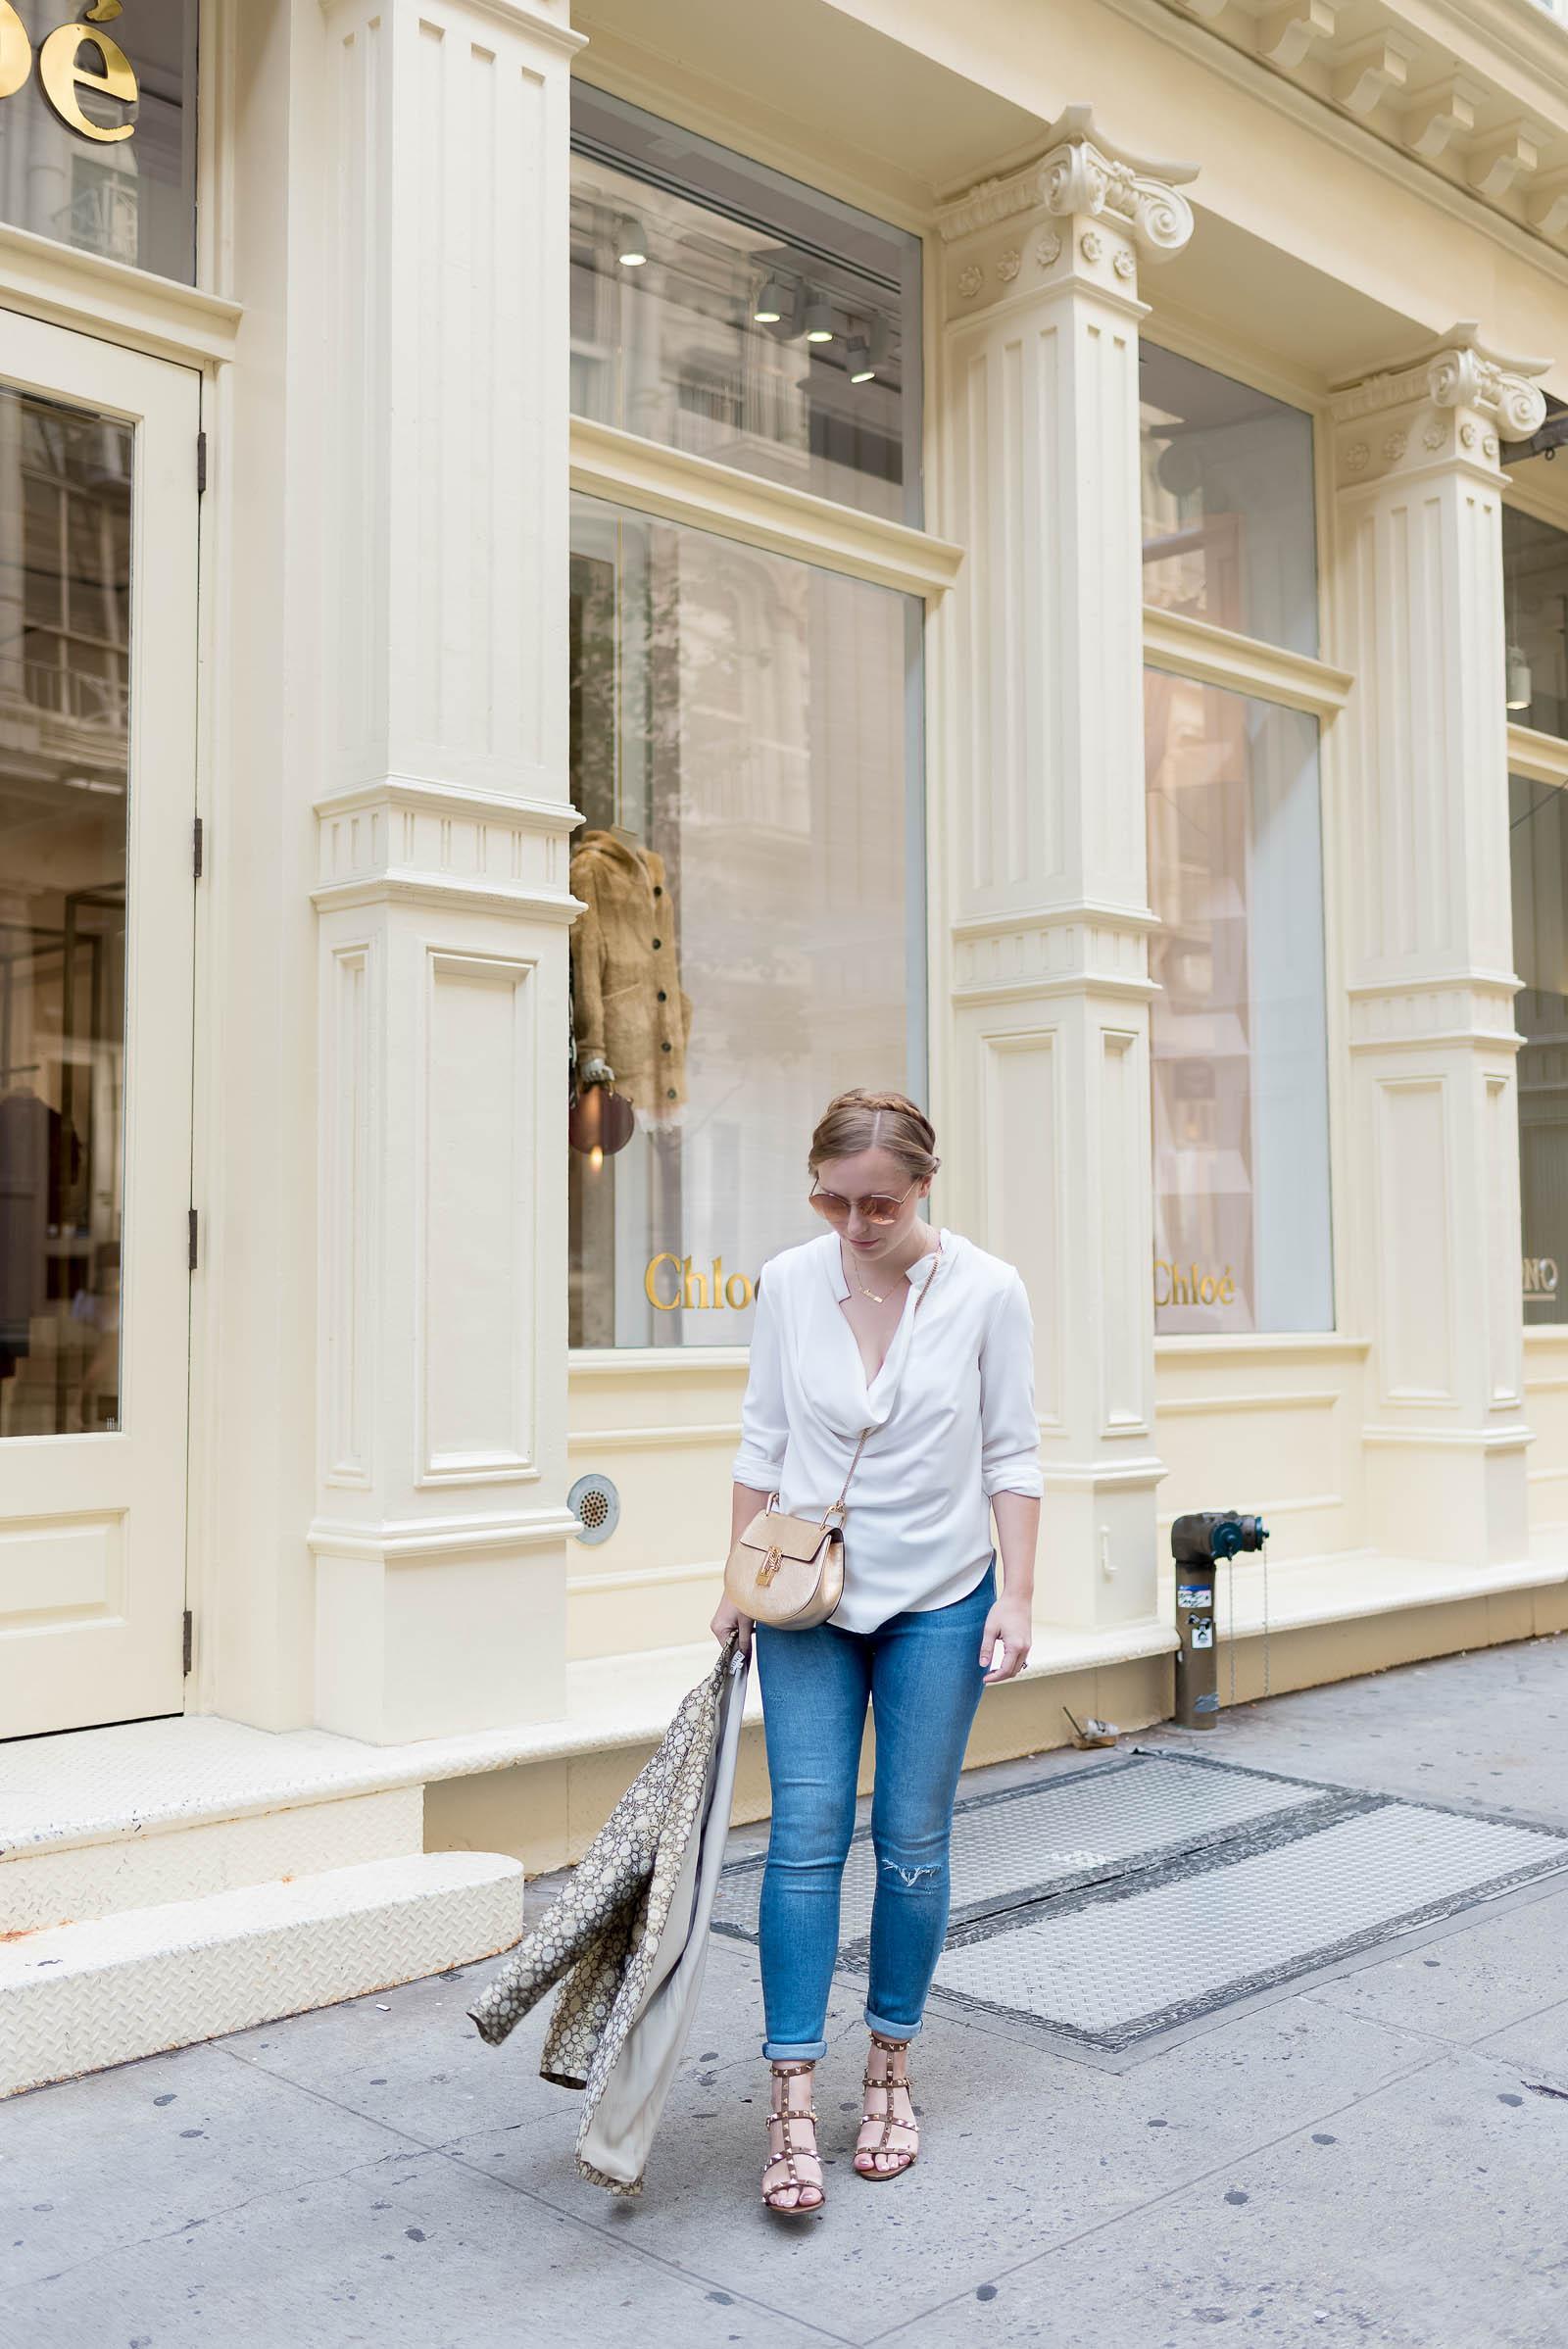 NYFW Soho Street Style in Jeans